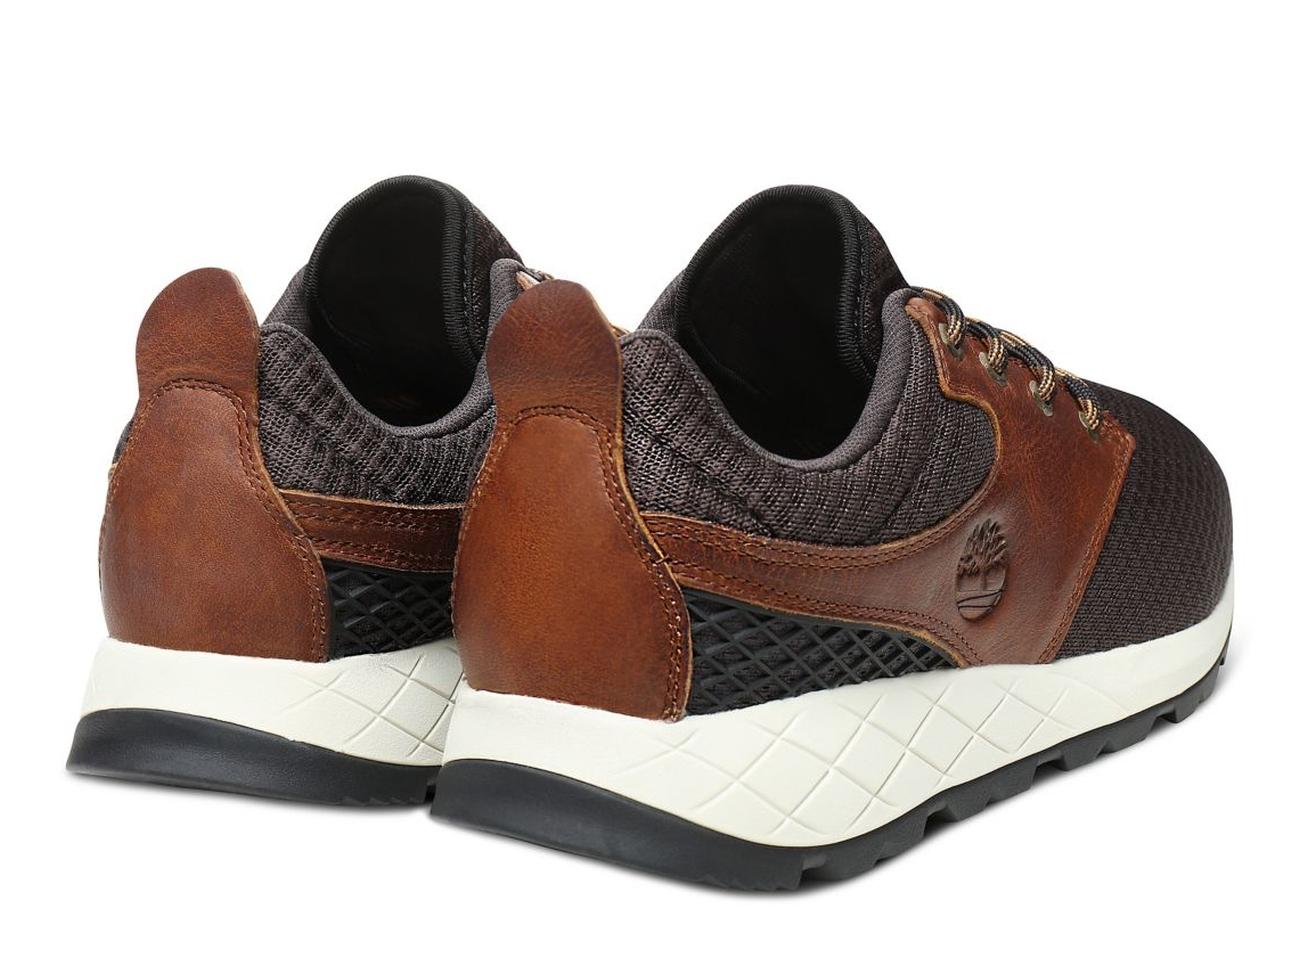 Timberland Sneaker 'tuckerman' Mit Lederbesatz Herren Schuhe